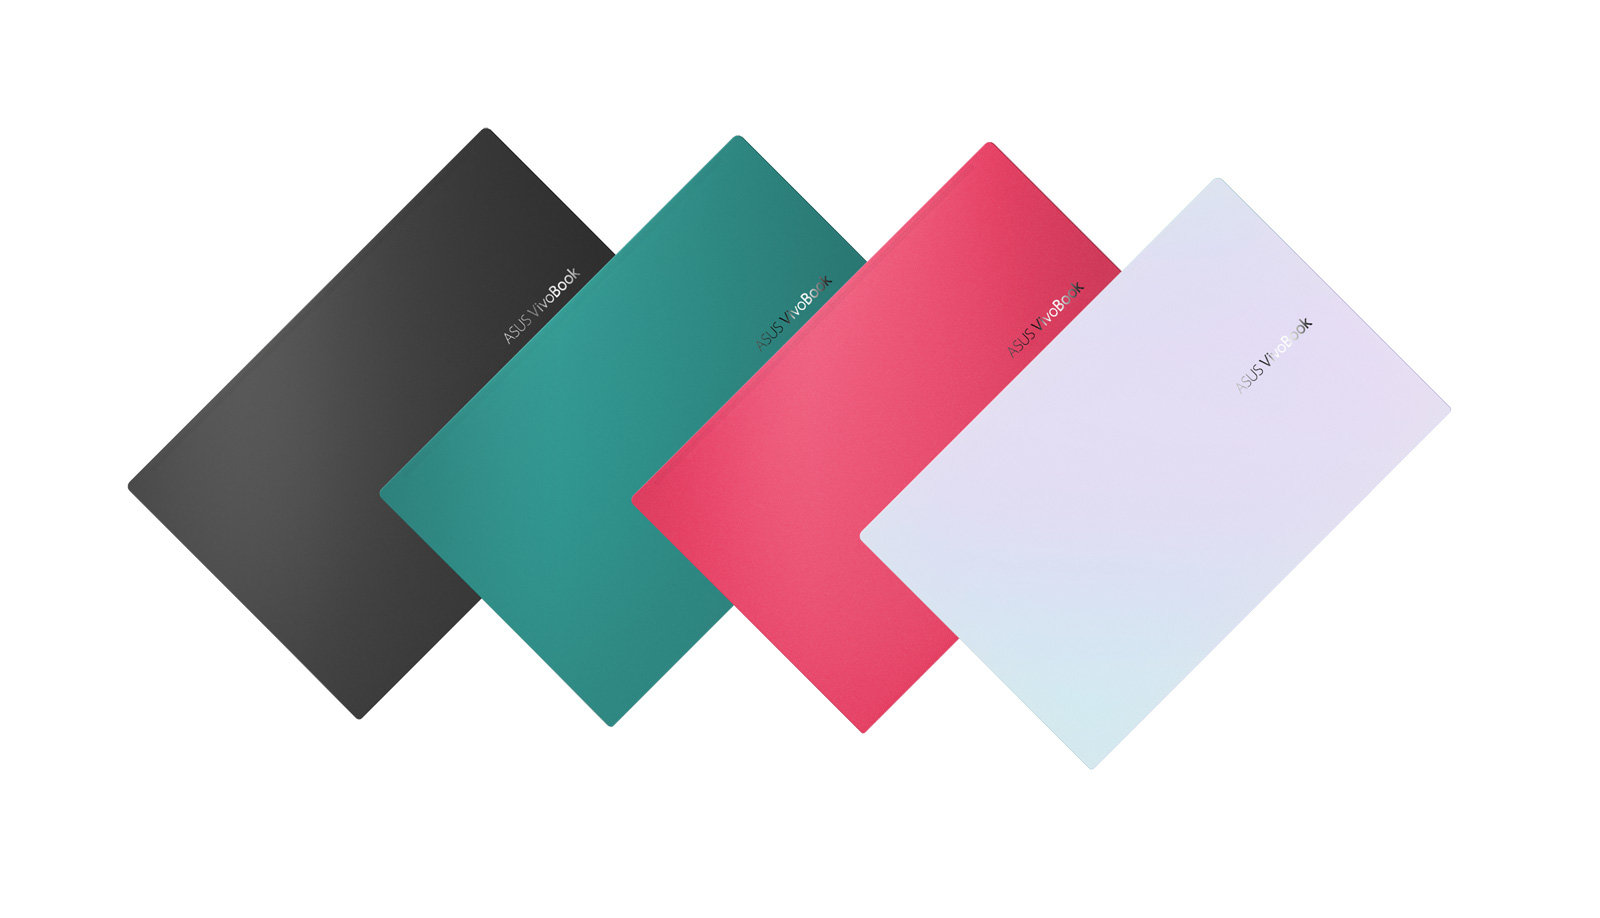 ZenBook Duo i kolorowe VivoBooki S - tym kusi Asus na CES 2020 21